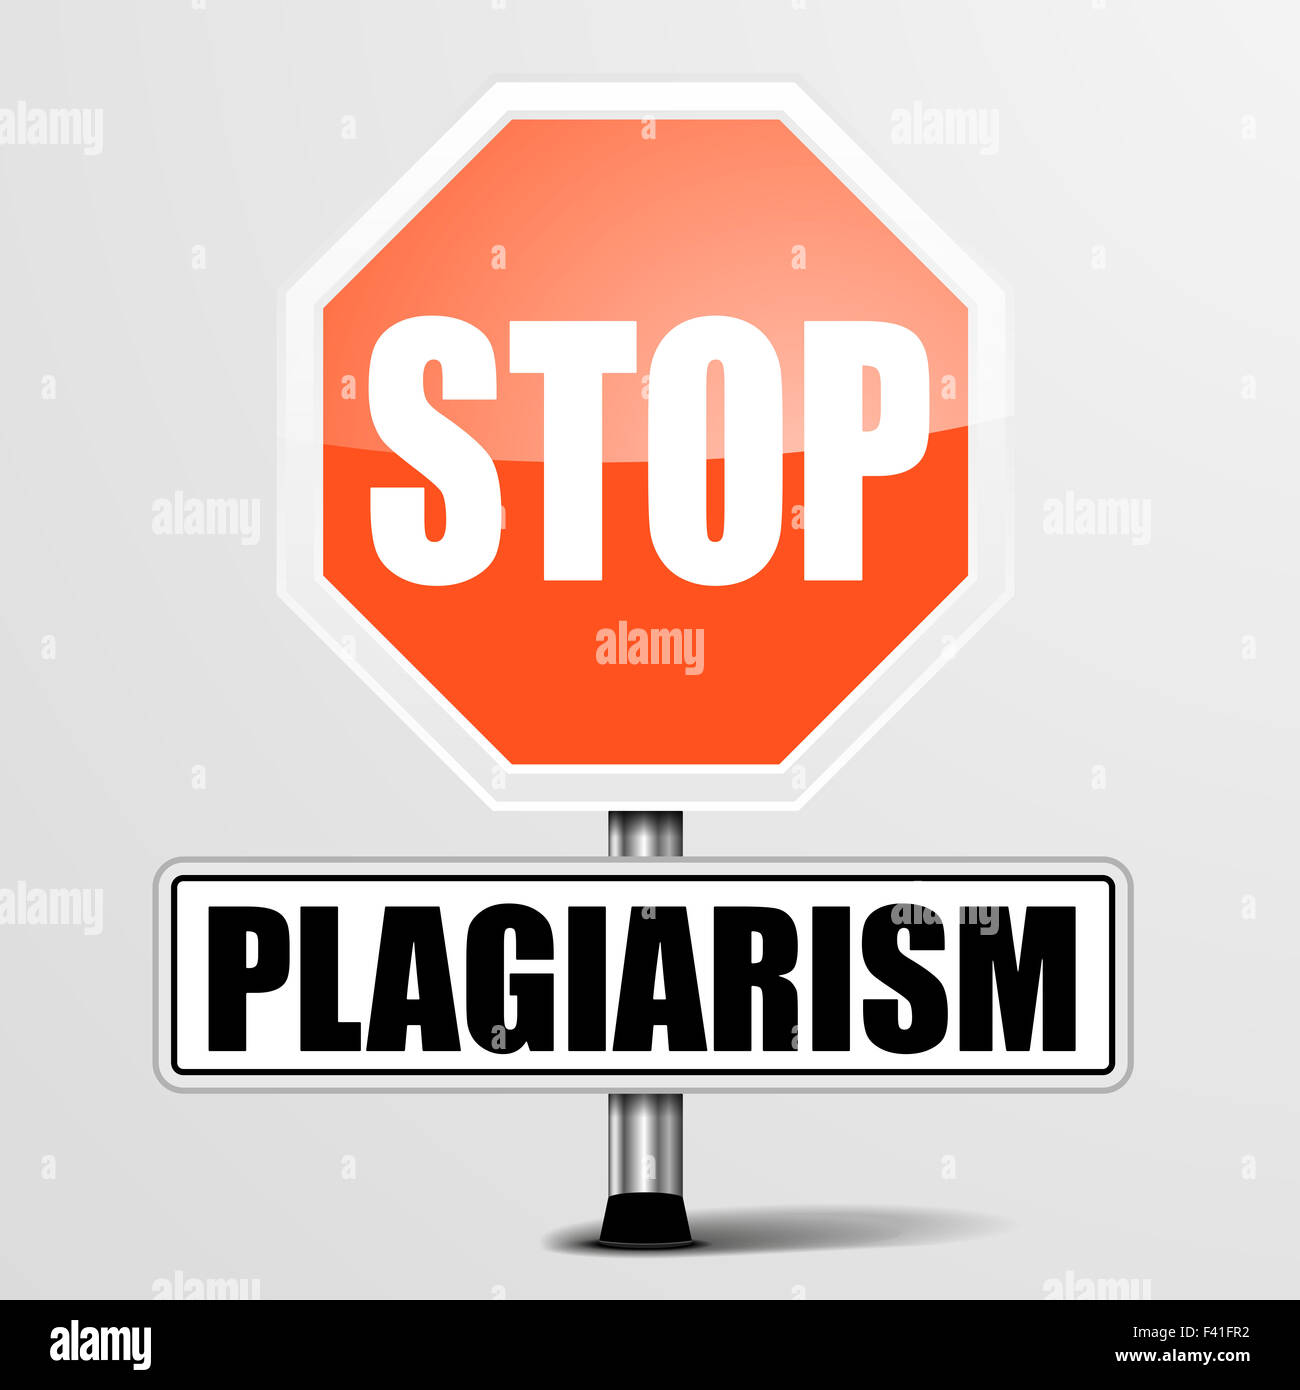 Stop Plagiarism - Stock Image